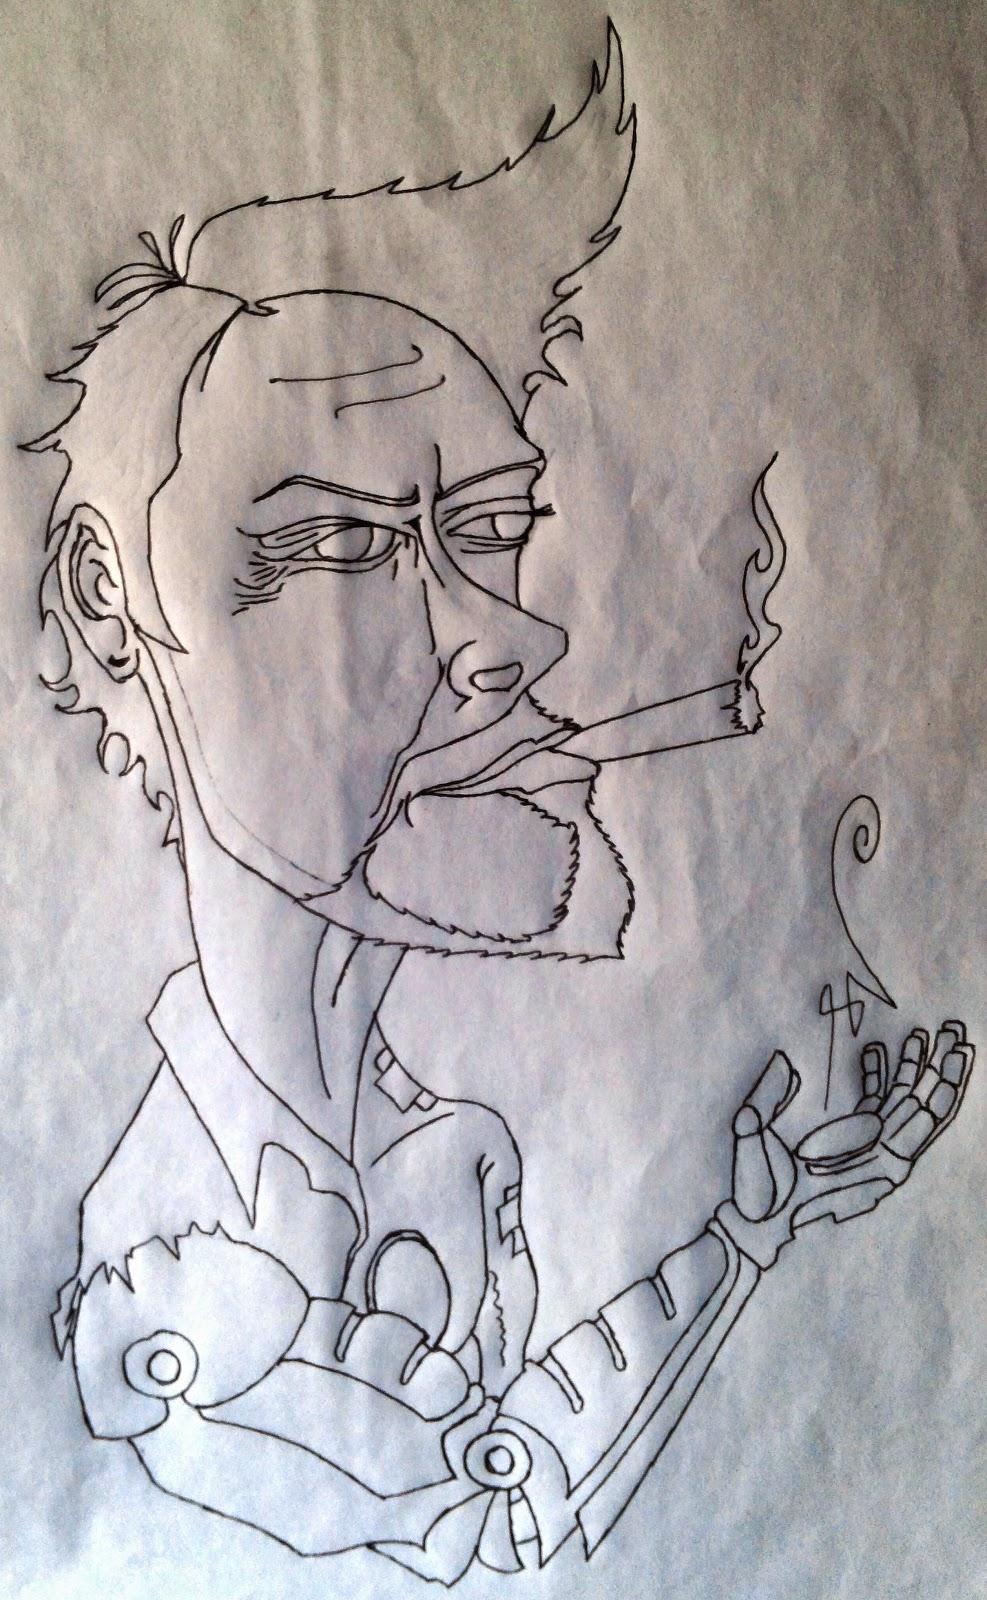 Ignite Dreams : Rough caricature of Tony Stark